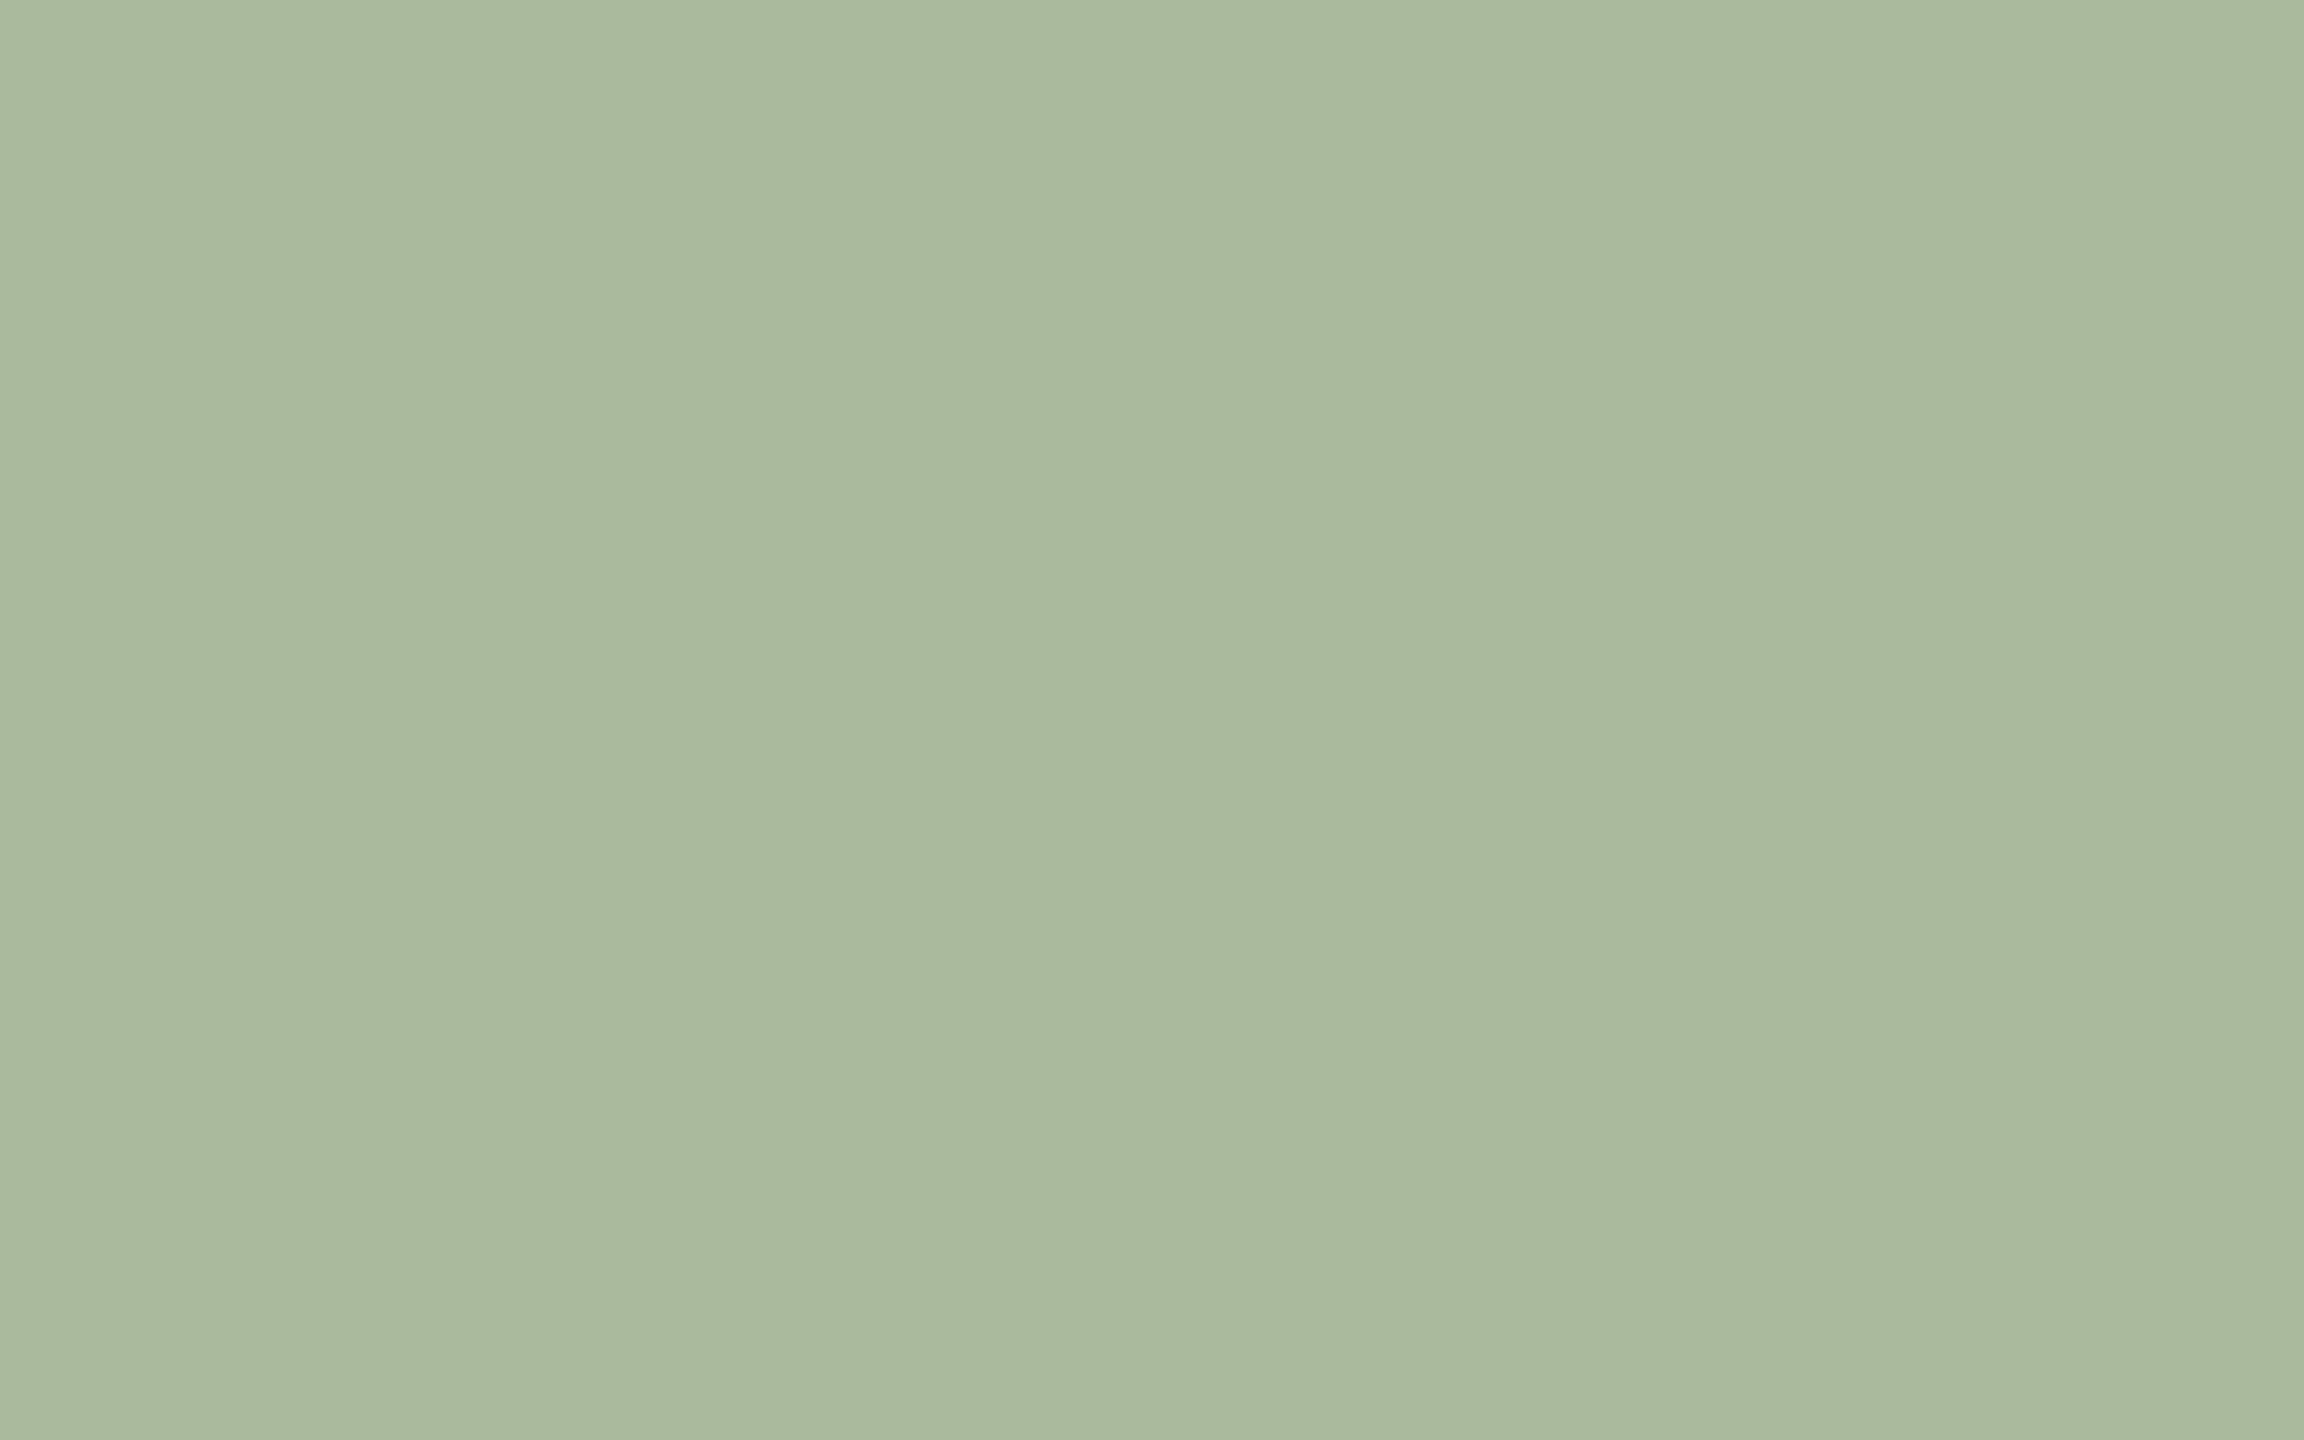 2304x1440 Laurel Green Solid Color Background